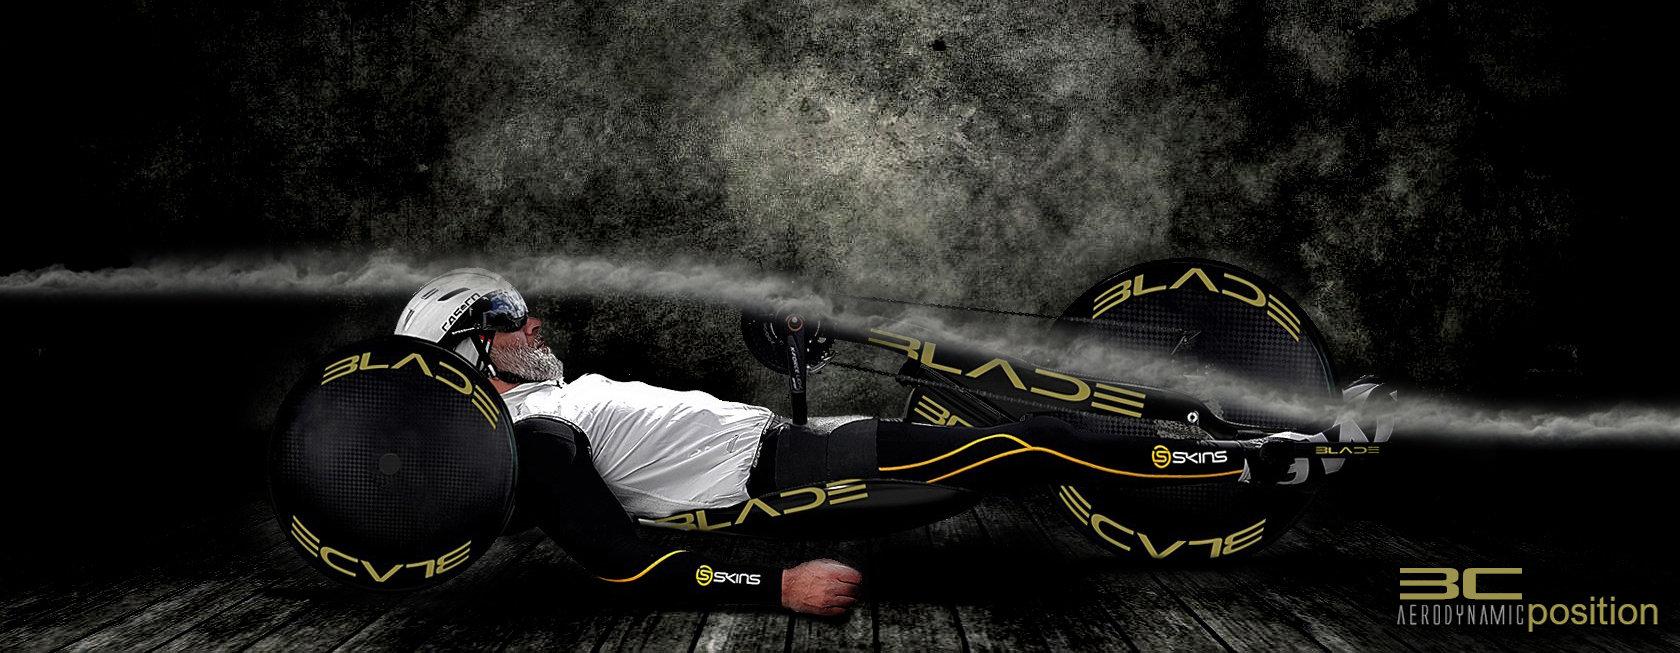 blade-gold pozice- aerodynamic.jpg